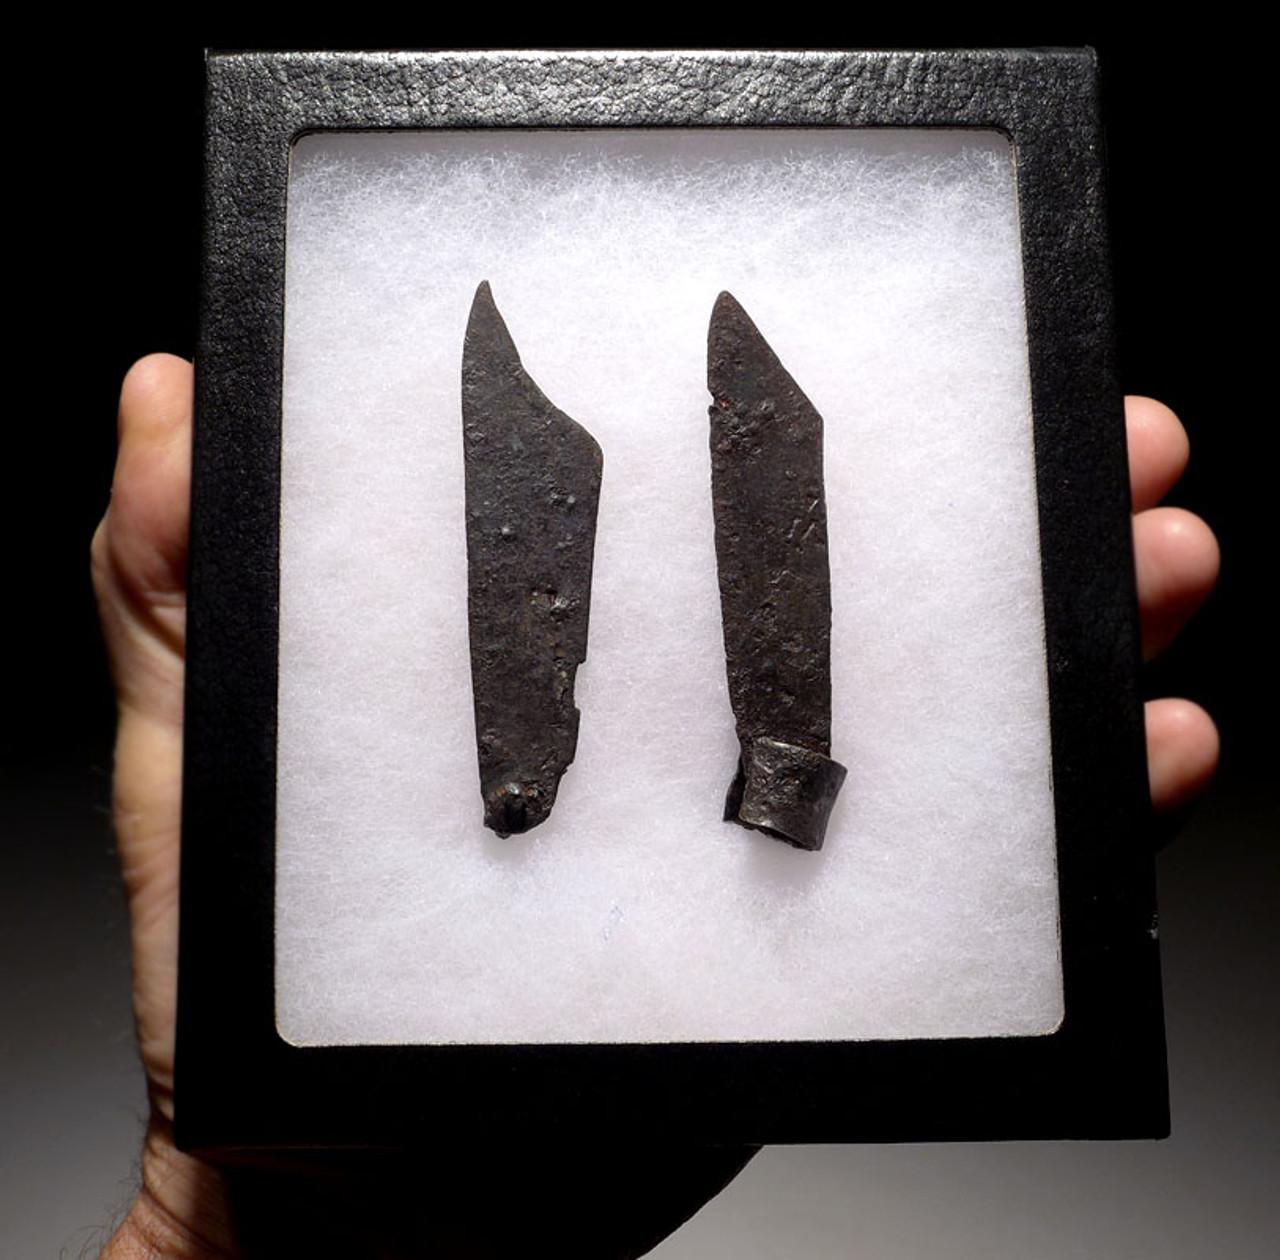 R127 - TWO ANCIENT ROMAN IRON FOLDING KNIFE BLADES